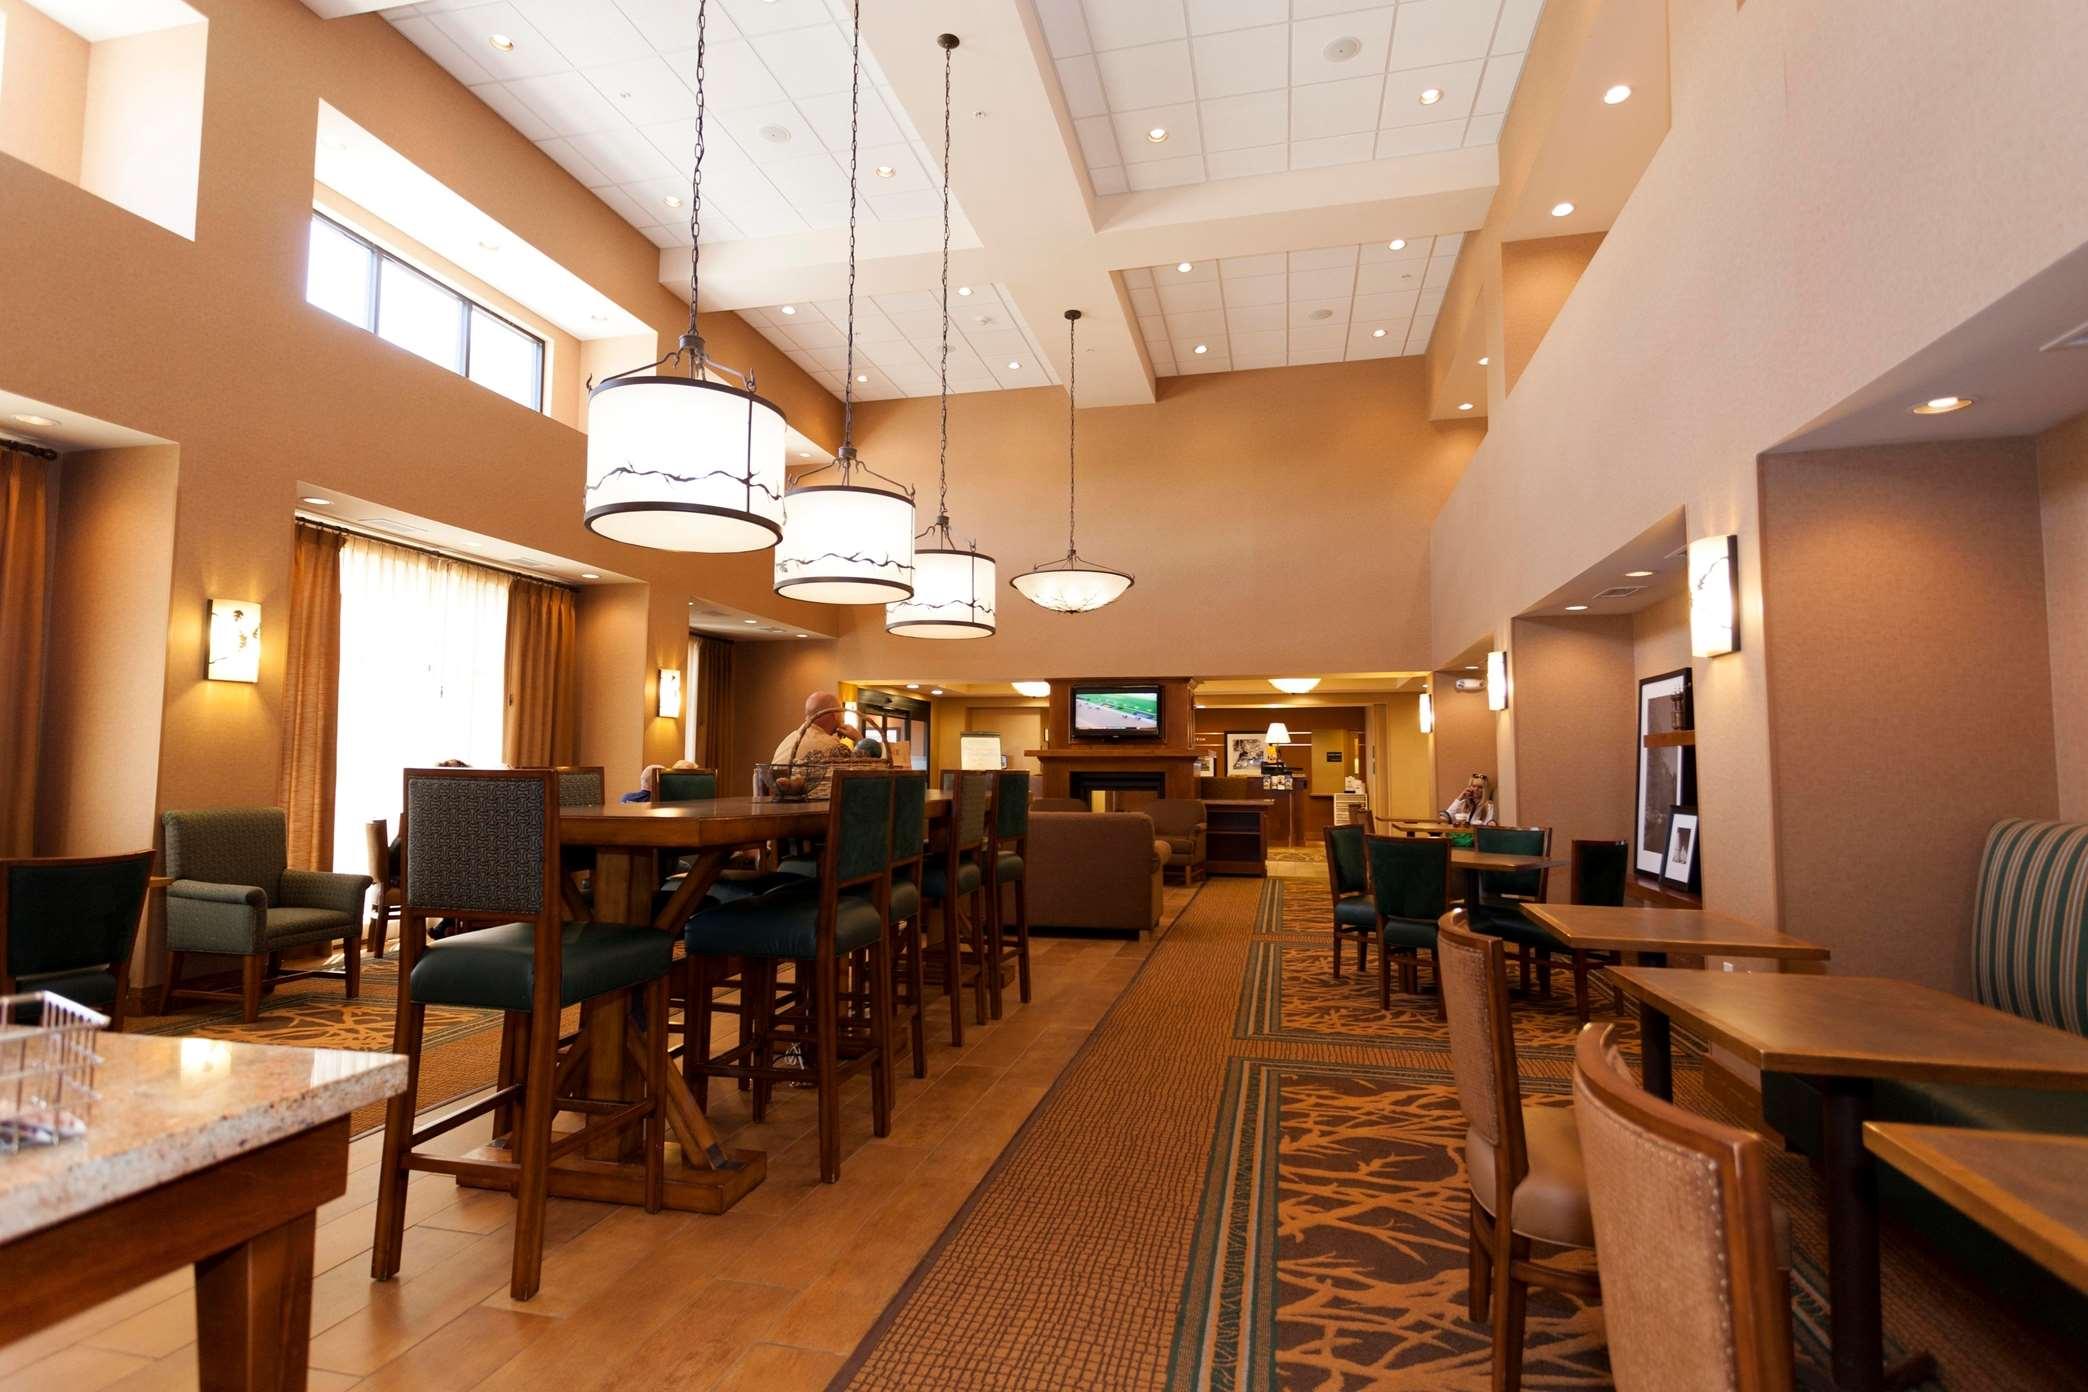 Hampton Inn & Suites Riverton image 31